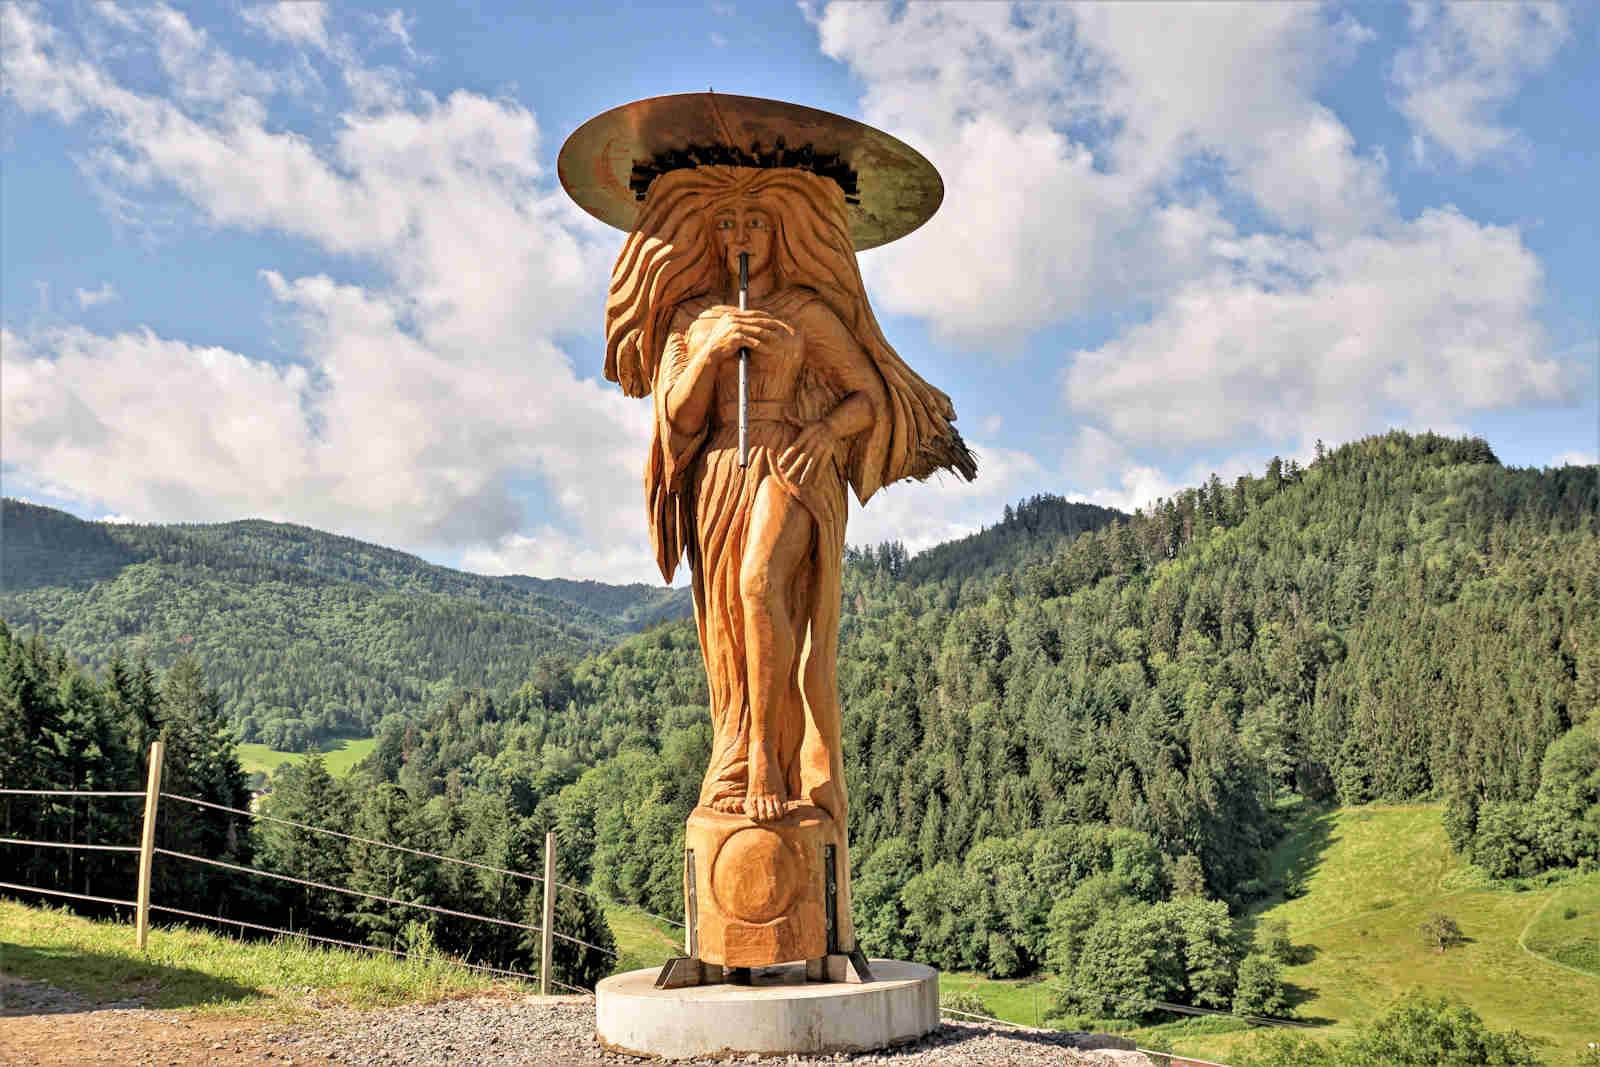 Anima Mundi, Freiburg-Kappel im Juni 2020, thomas rees